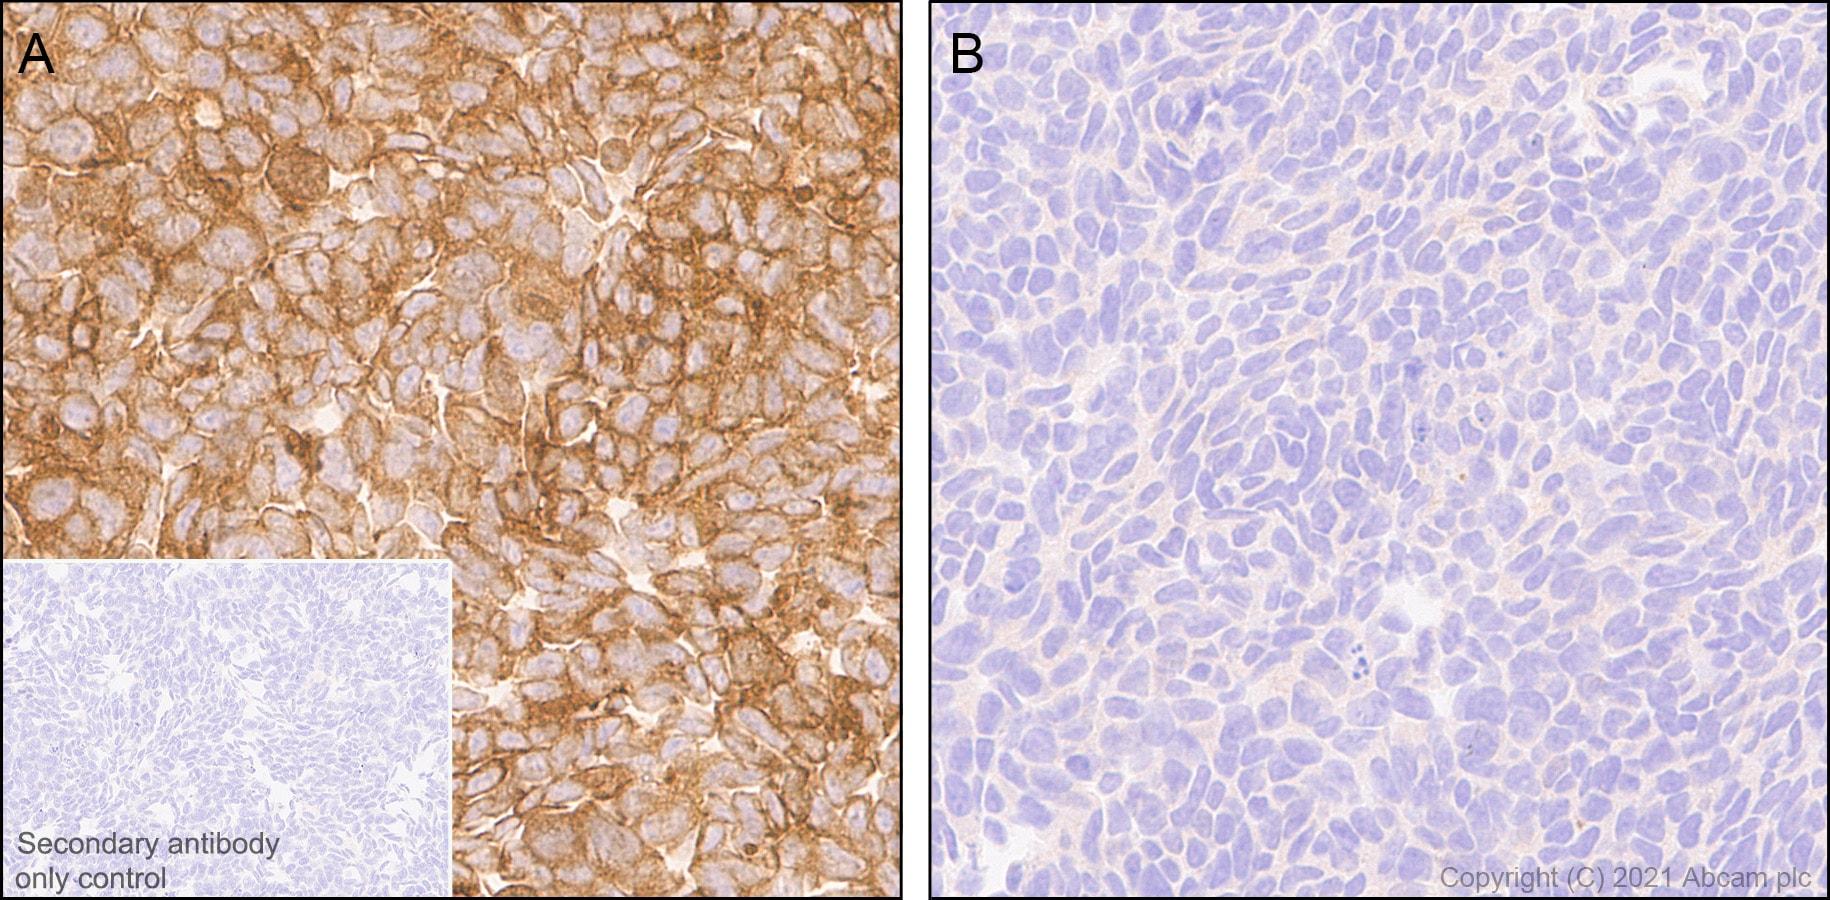 Immunohistochemistry (Formalin/PFA-fixed paraffin-embedded sections) - Anti-Calcineurin A antibody [EPR24997-22] (ab282104)